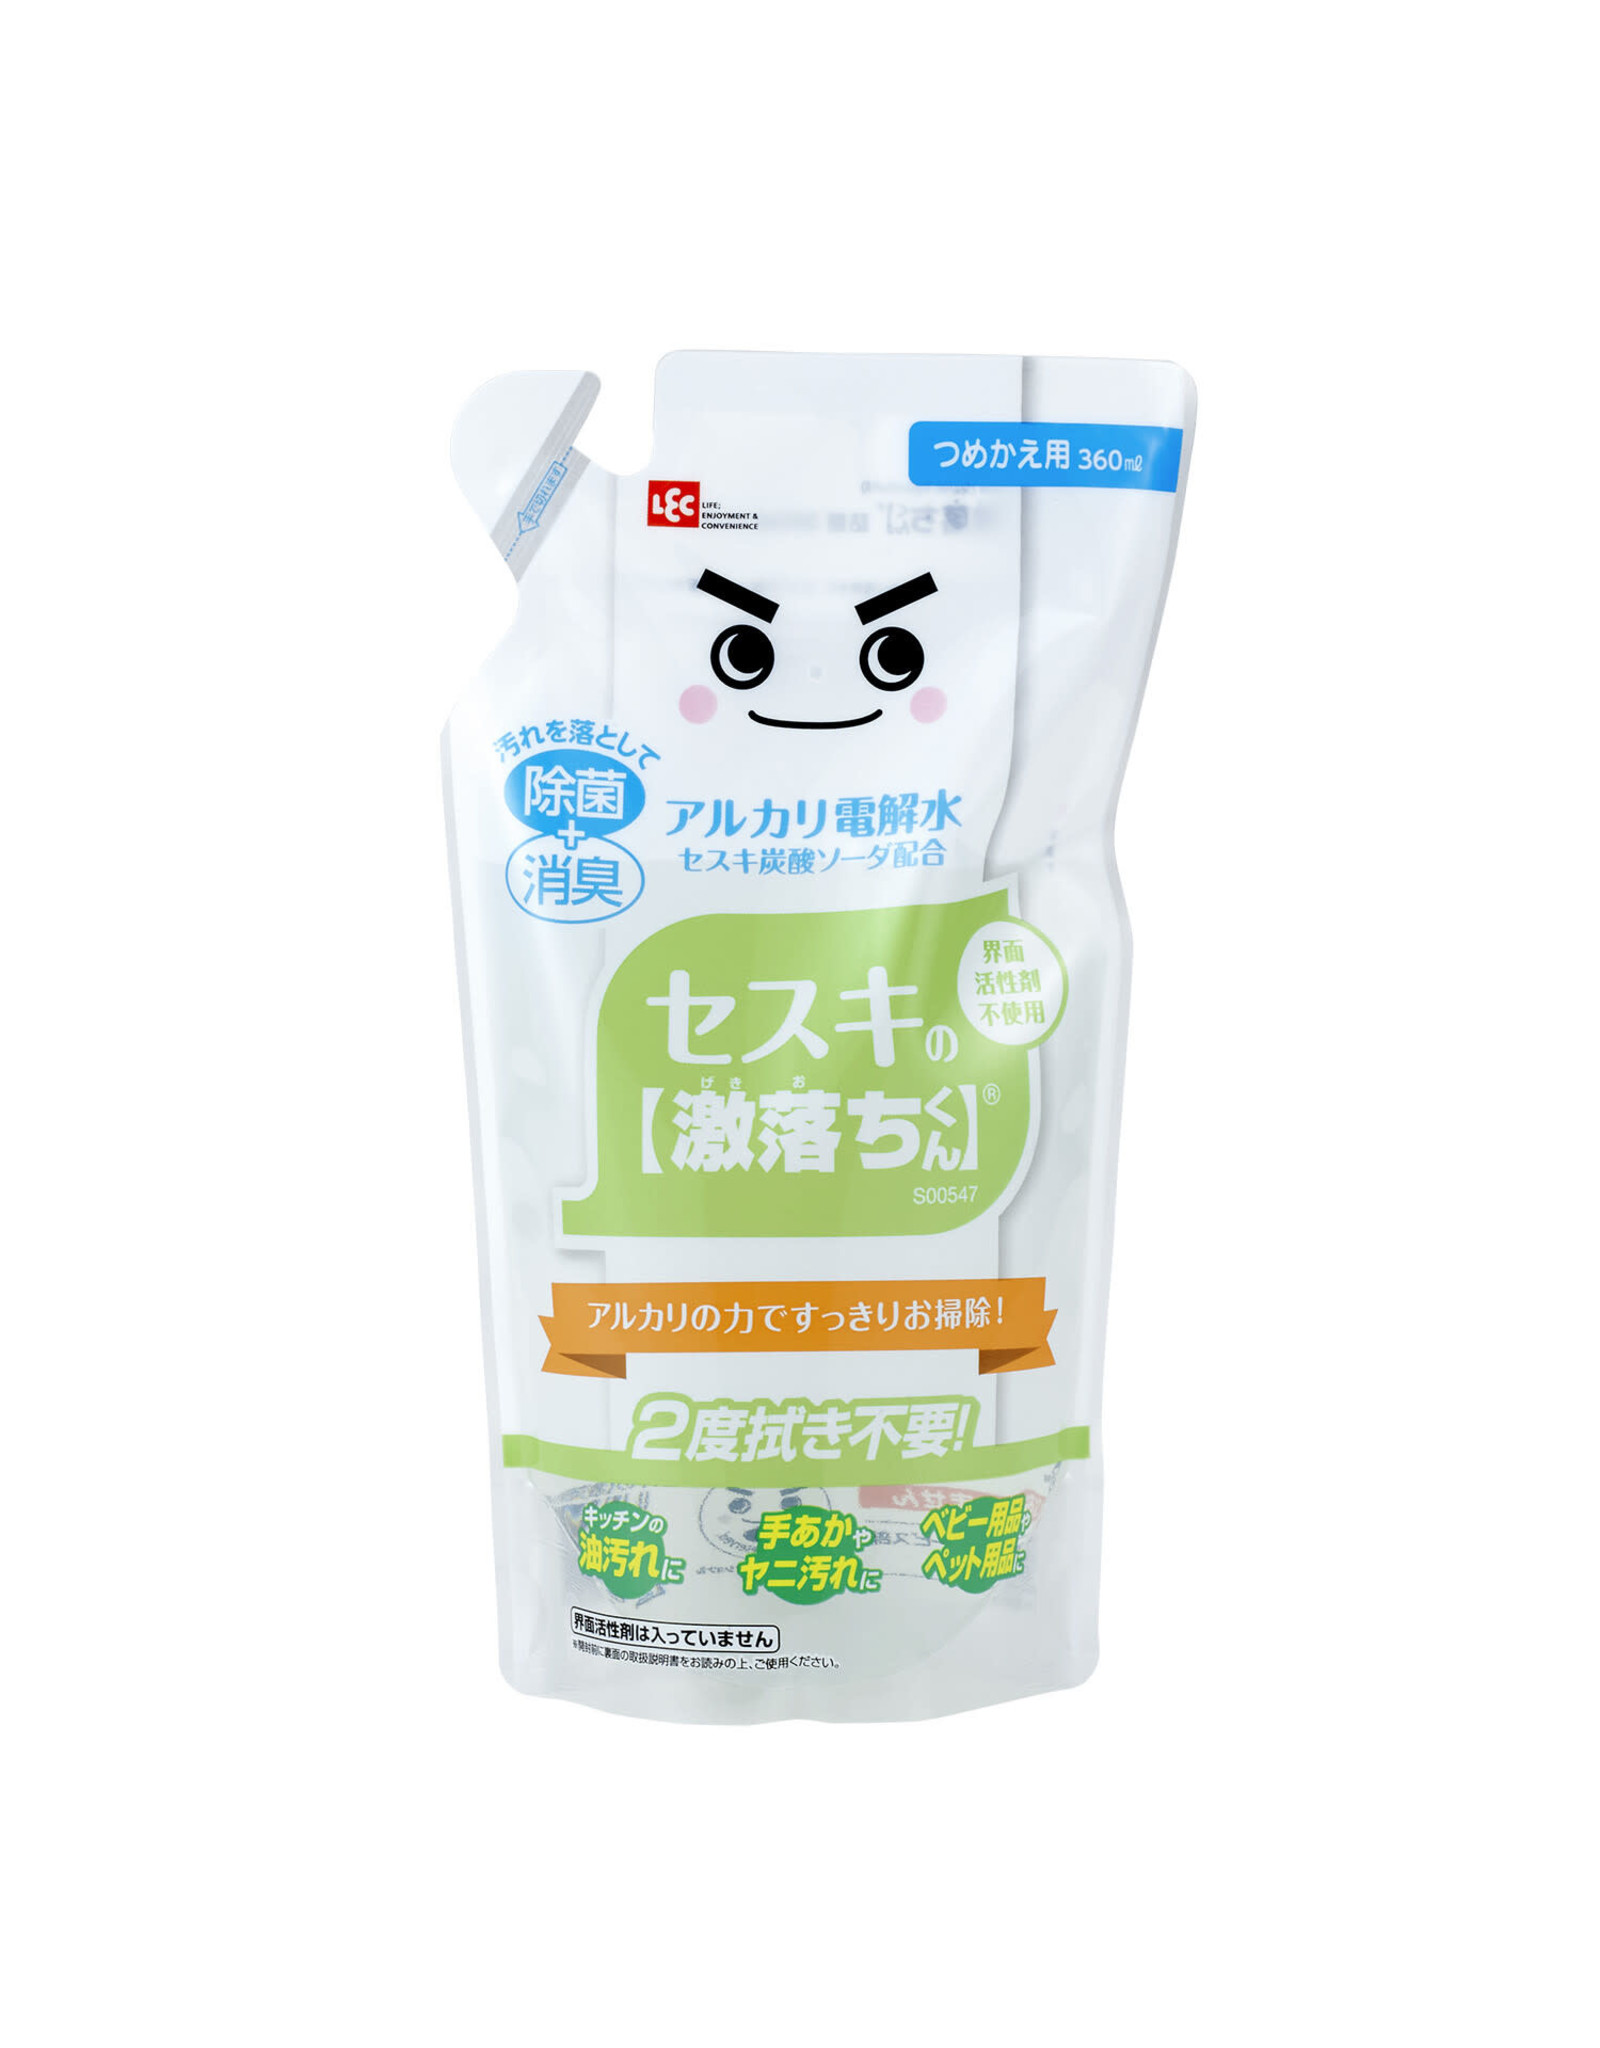 LEC LEC Gekiochi Sesqui Cleaning Liquid Refill 360ml